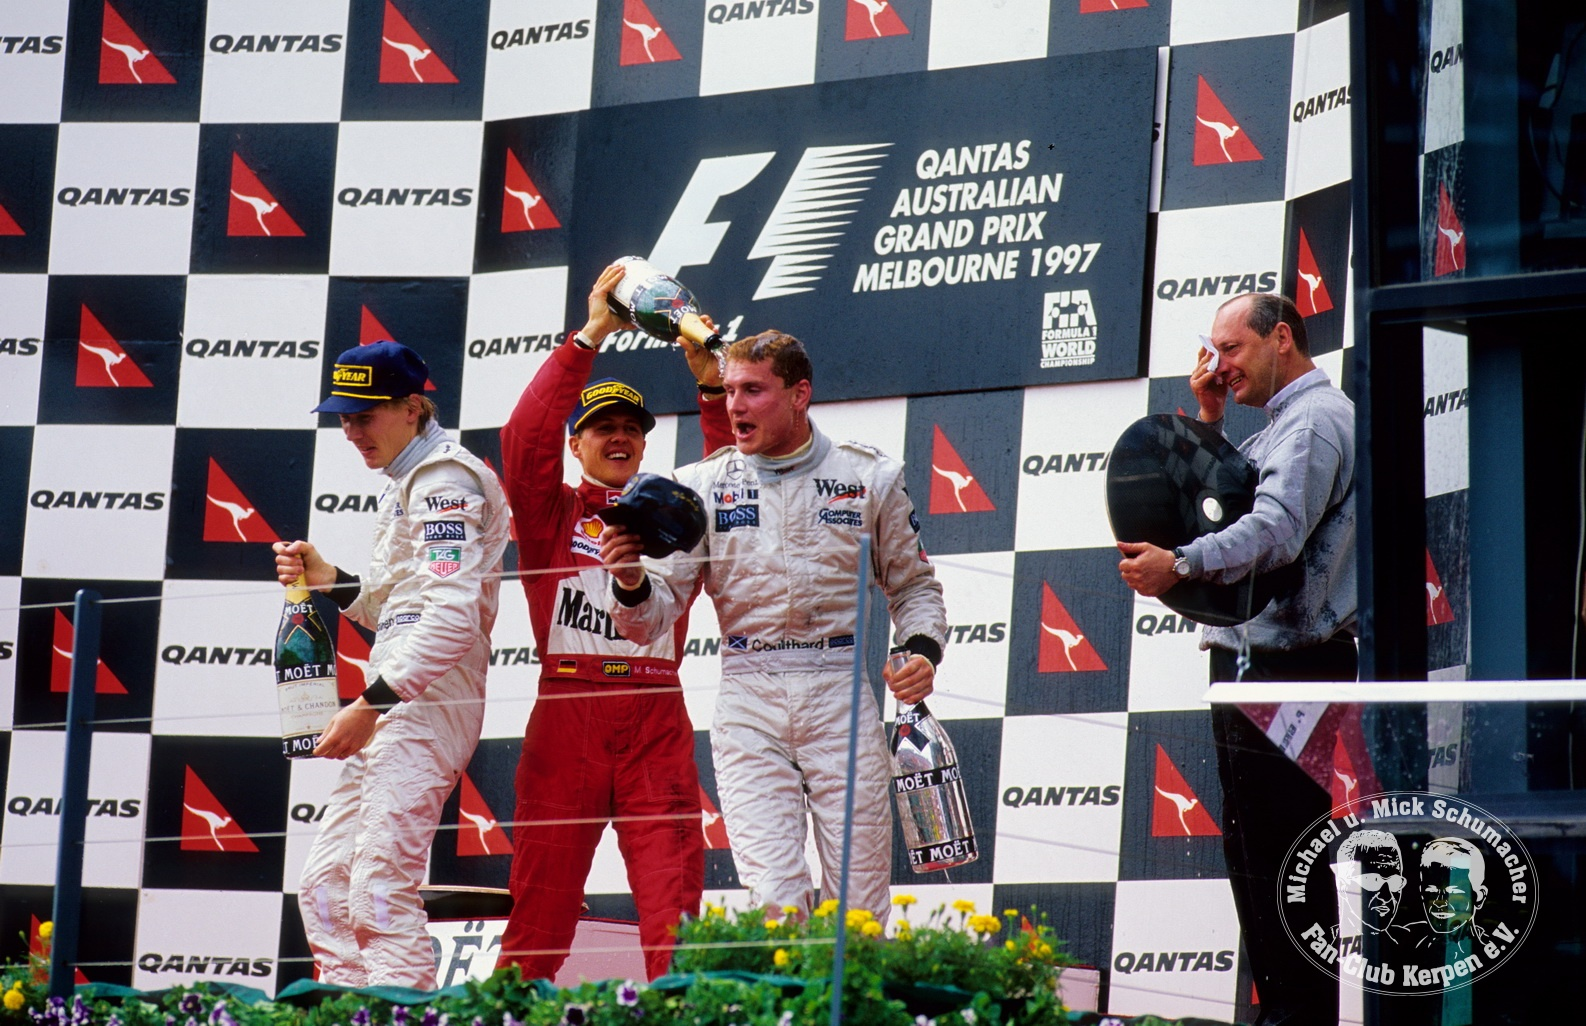 Formel 1, Grand Prix Australien 1997, Melbourne, 09.03.1997